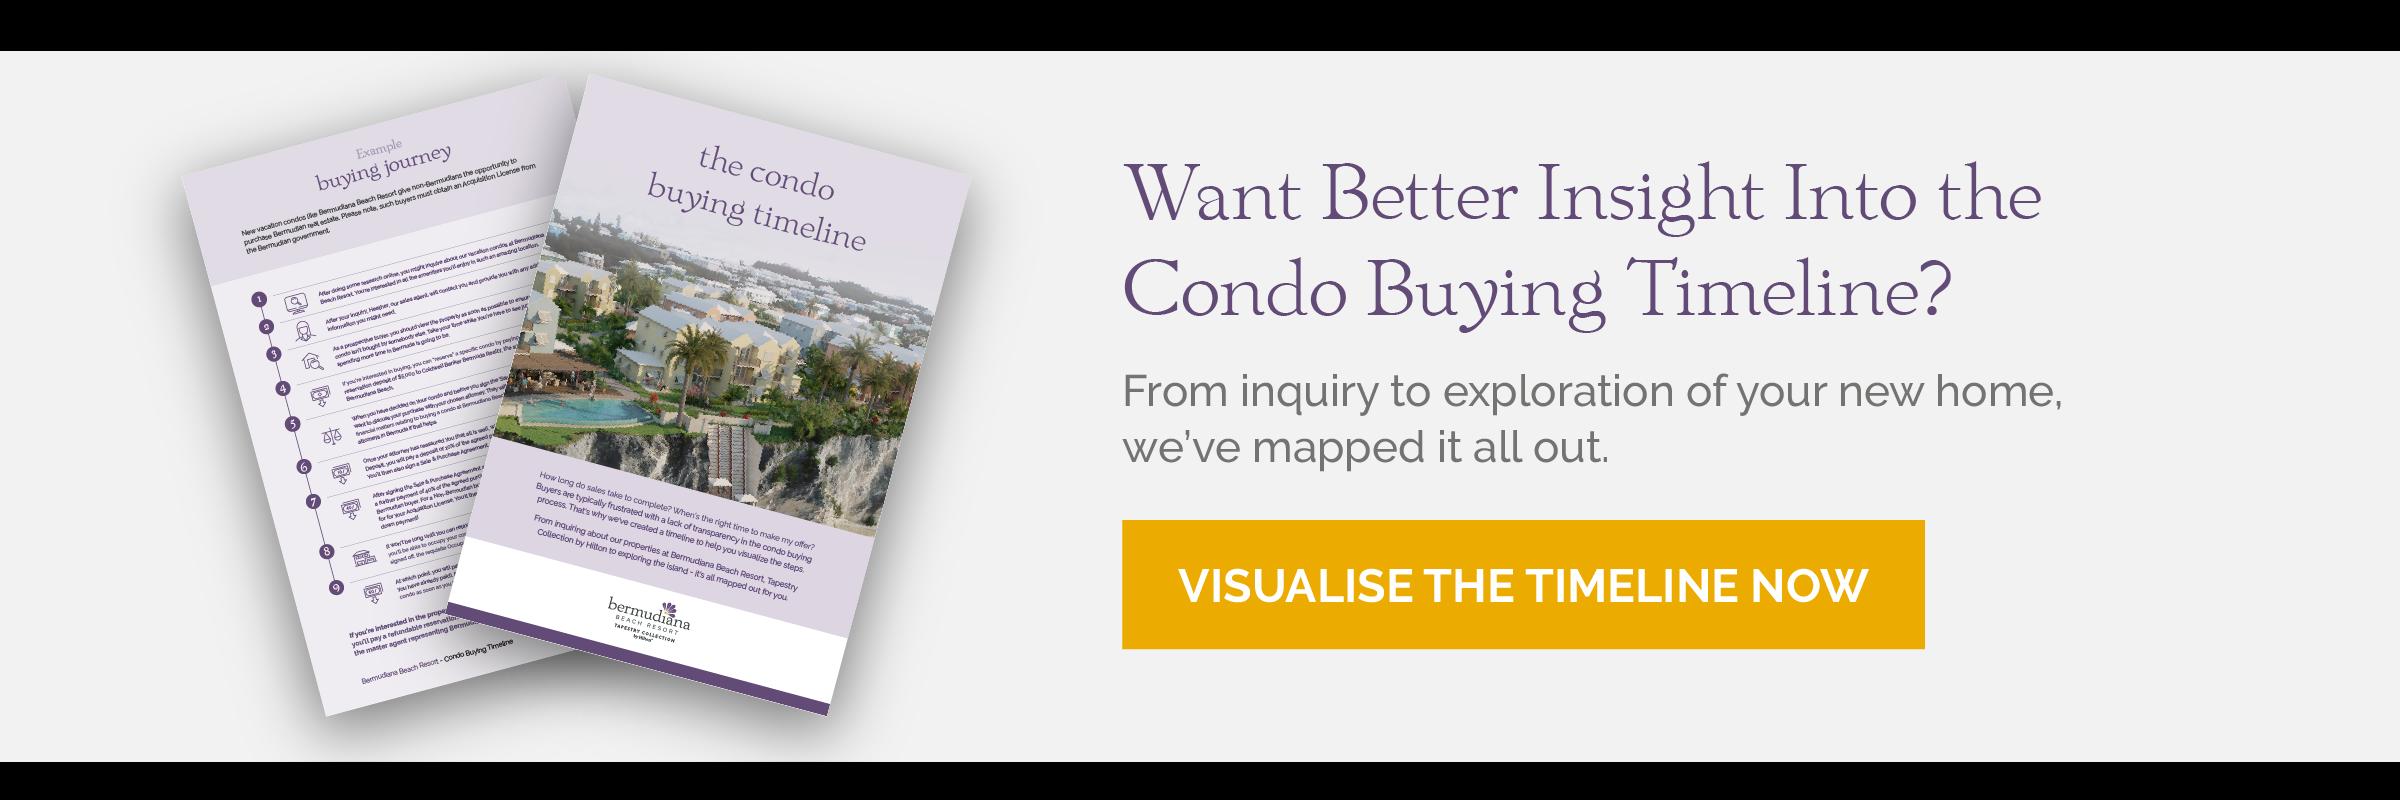 condo buying timeline